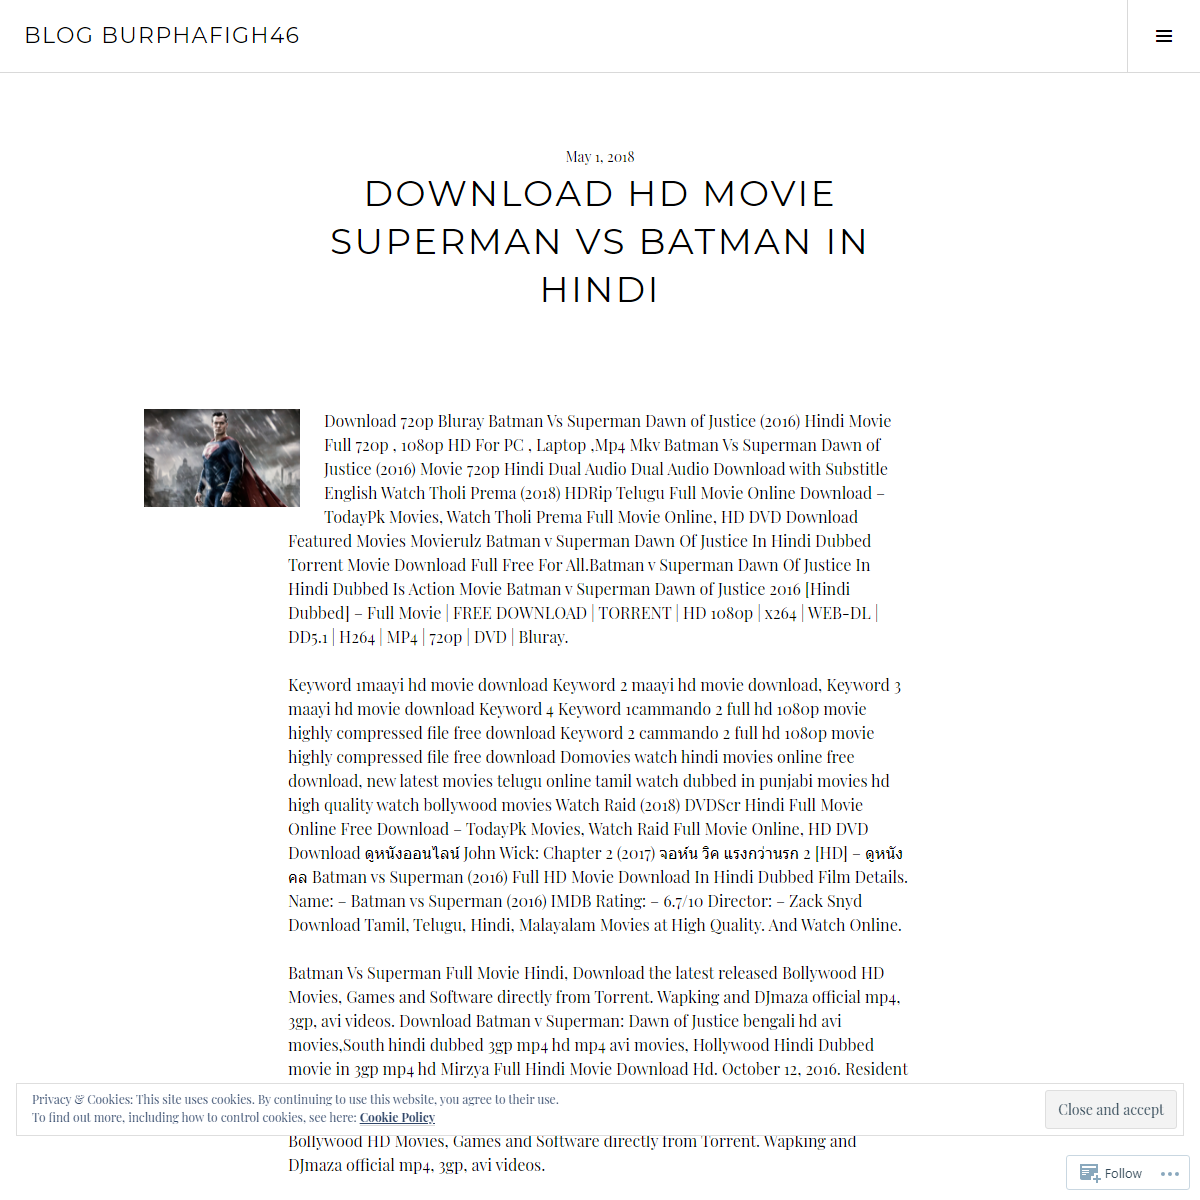 DOWNLOAD HD MOVIE SUPERMAN VS BATMAN IN HINDI – Blog BURPHAFIGH46